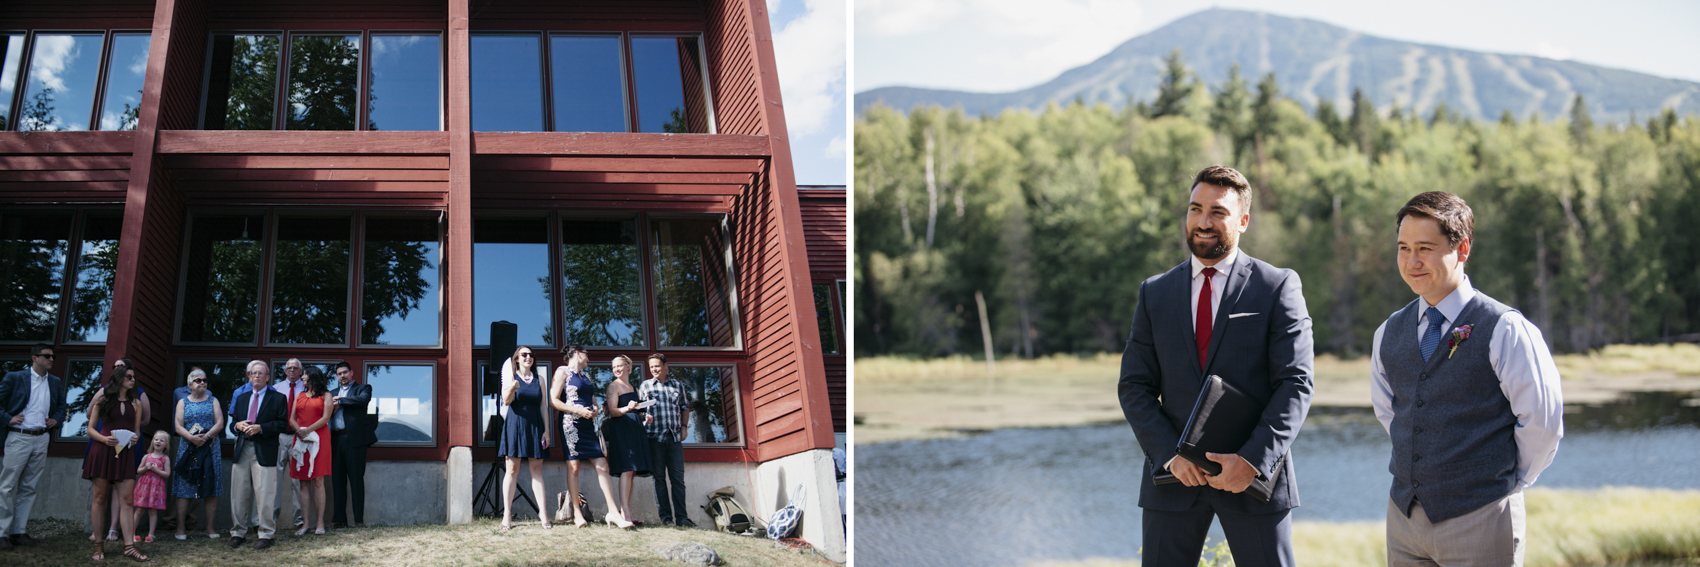 LFA_JuliaGlenn_Sugarloaf_Maine_Wedding009.jpg